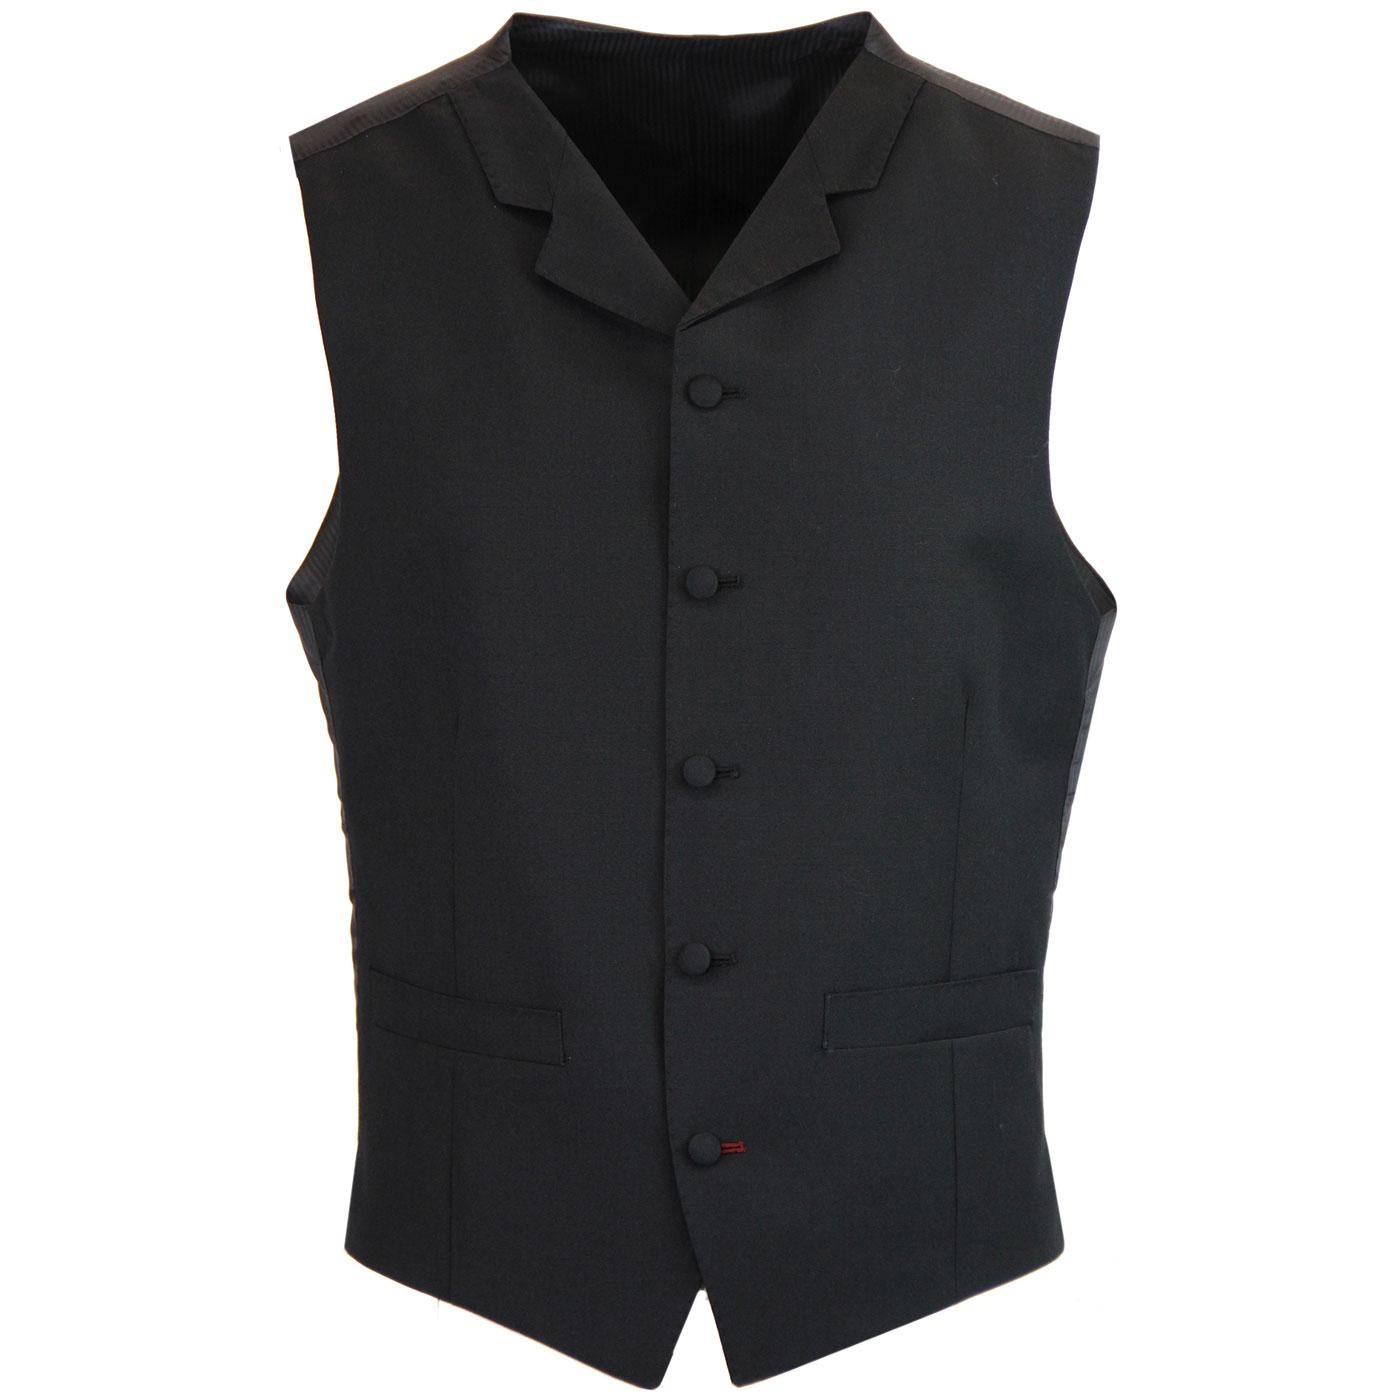 Madcap England 1960s Mod Mohair 5 Button Lapel Waistcoat in Black